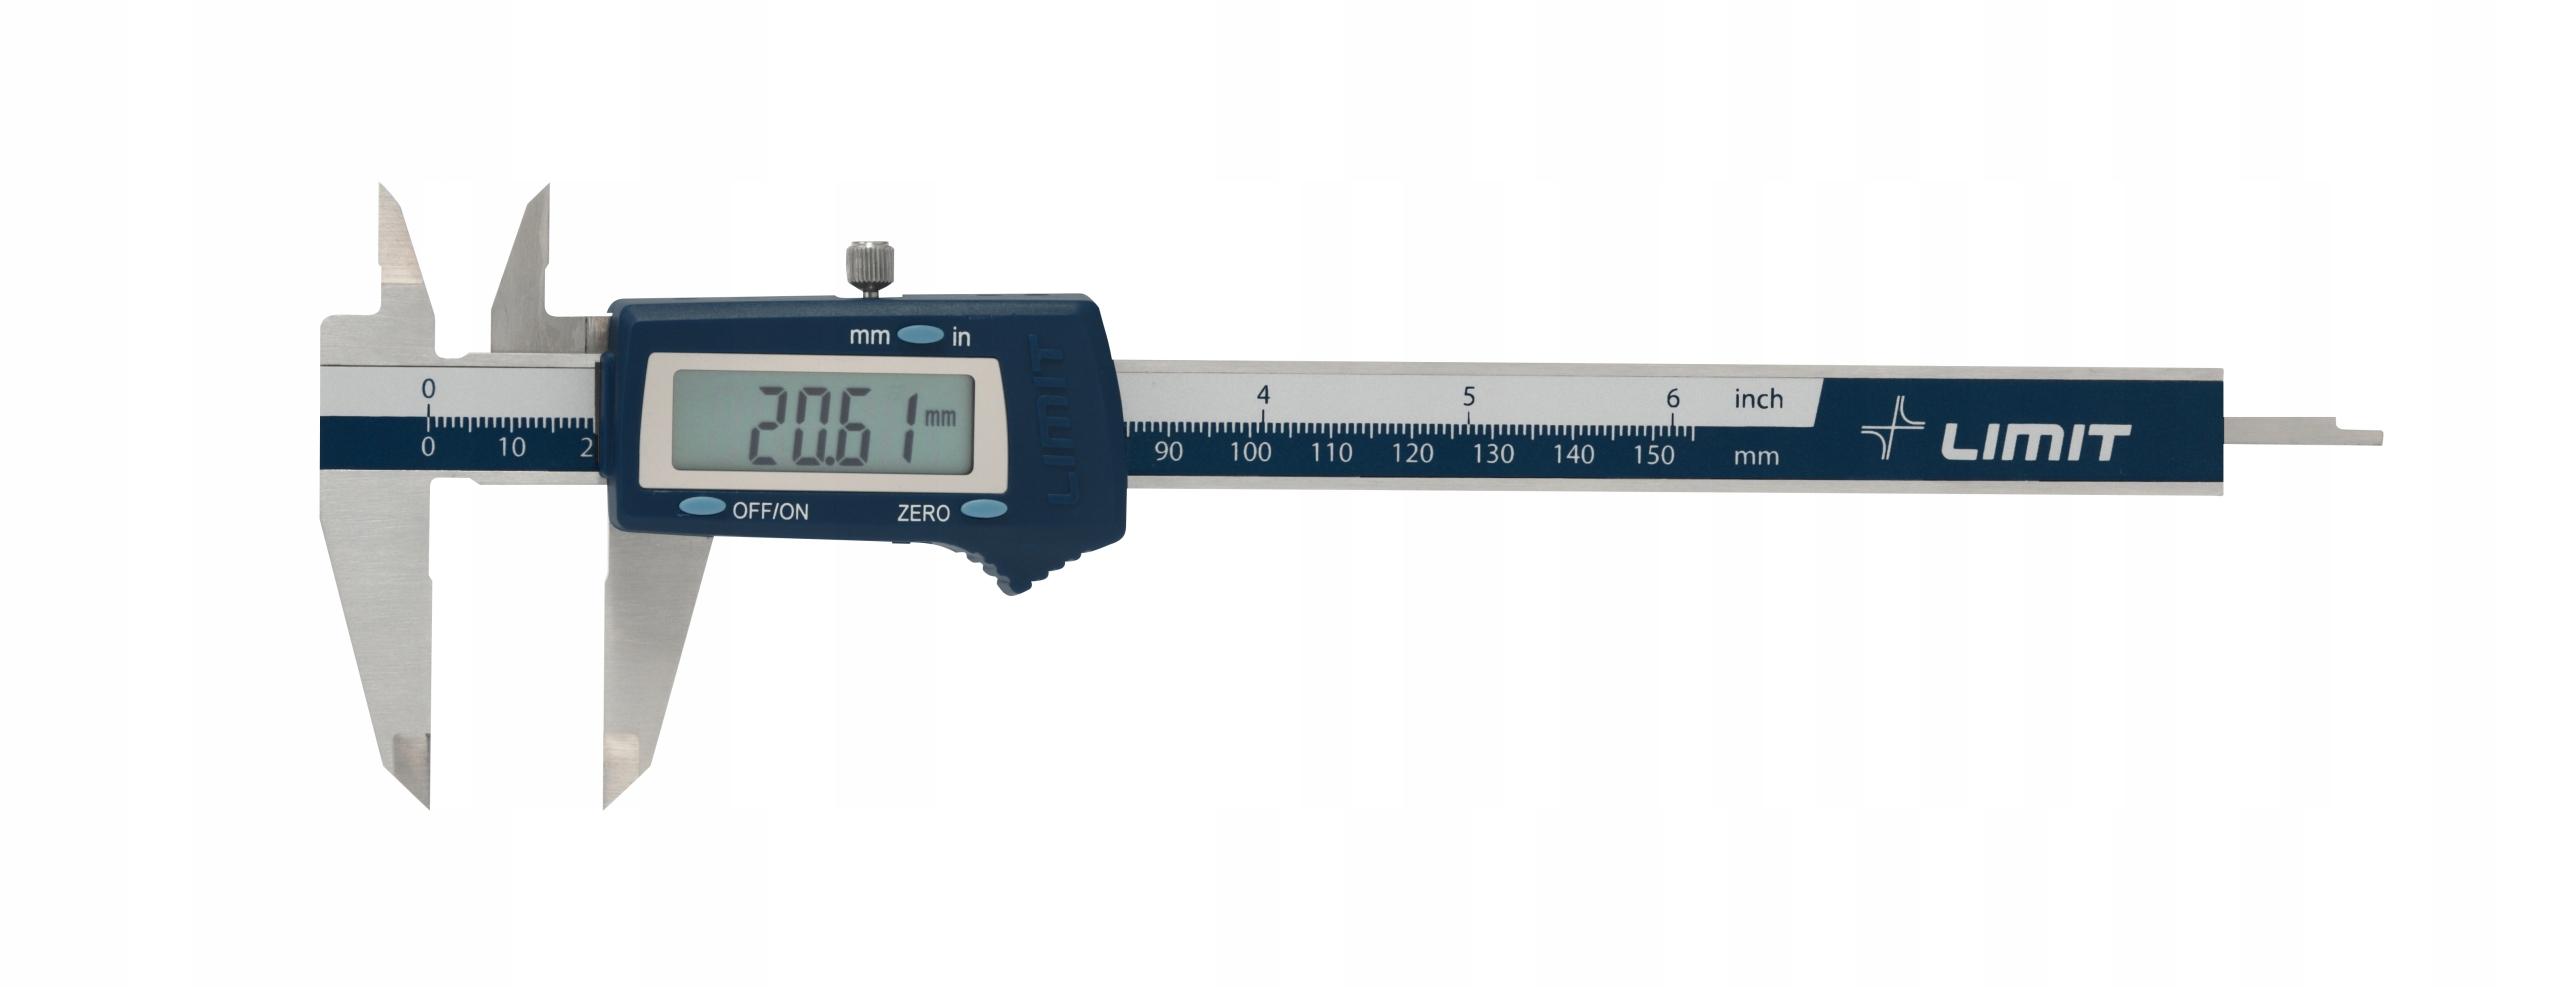 Цифровой штангенциркуль 150MM + LIMIT case